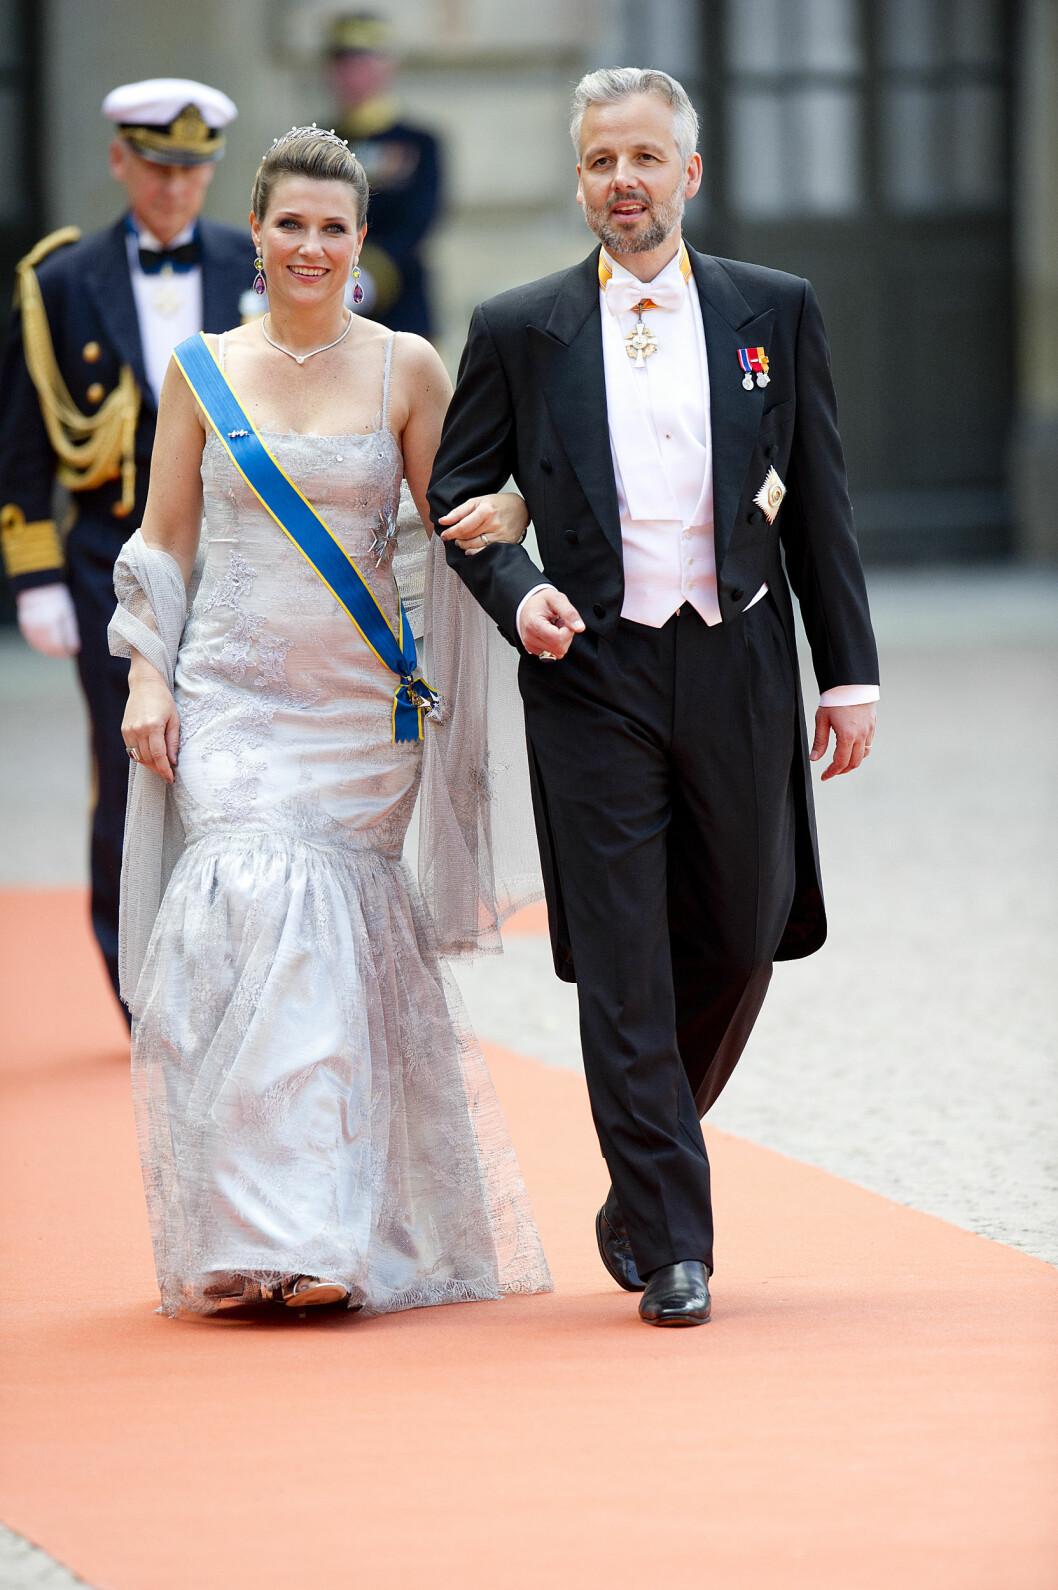 <strong>STILIG:</strong> Da Ari Behn ankom bryllupet til prins Carl Philip og Sofia Hellqvist sammen med prinsesse Märtha Louise i sommer, trillet Jan Thomas en sekser på terningen.   Foto: NTB scanpix